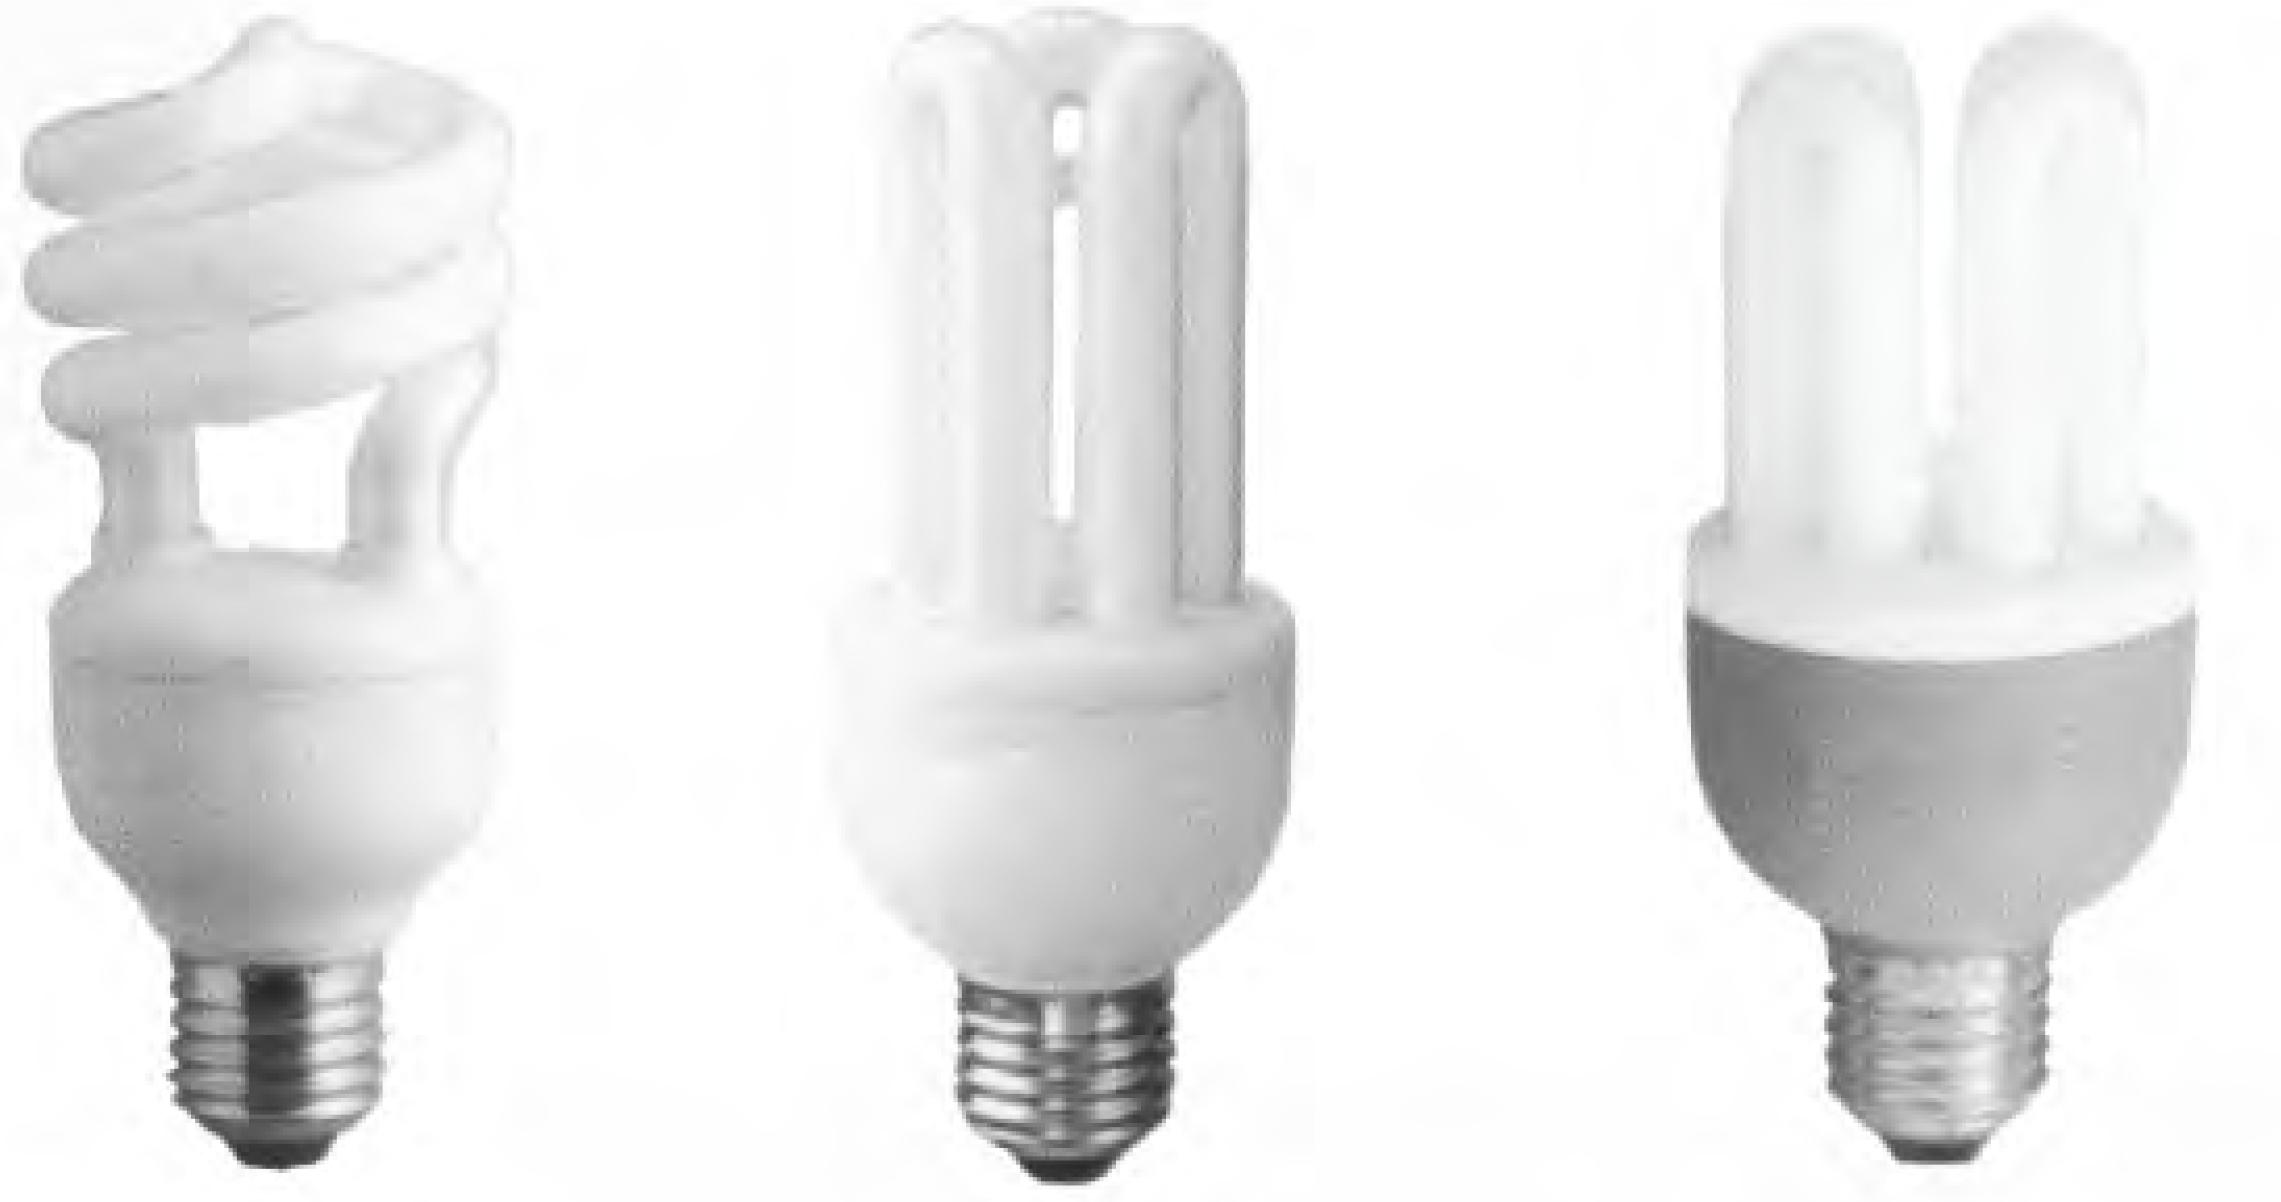 Dimmer Lamp Image